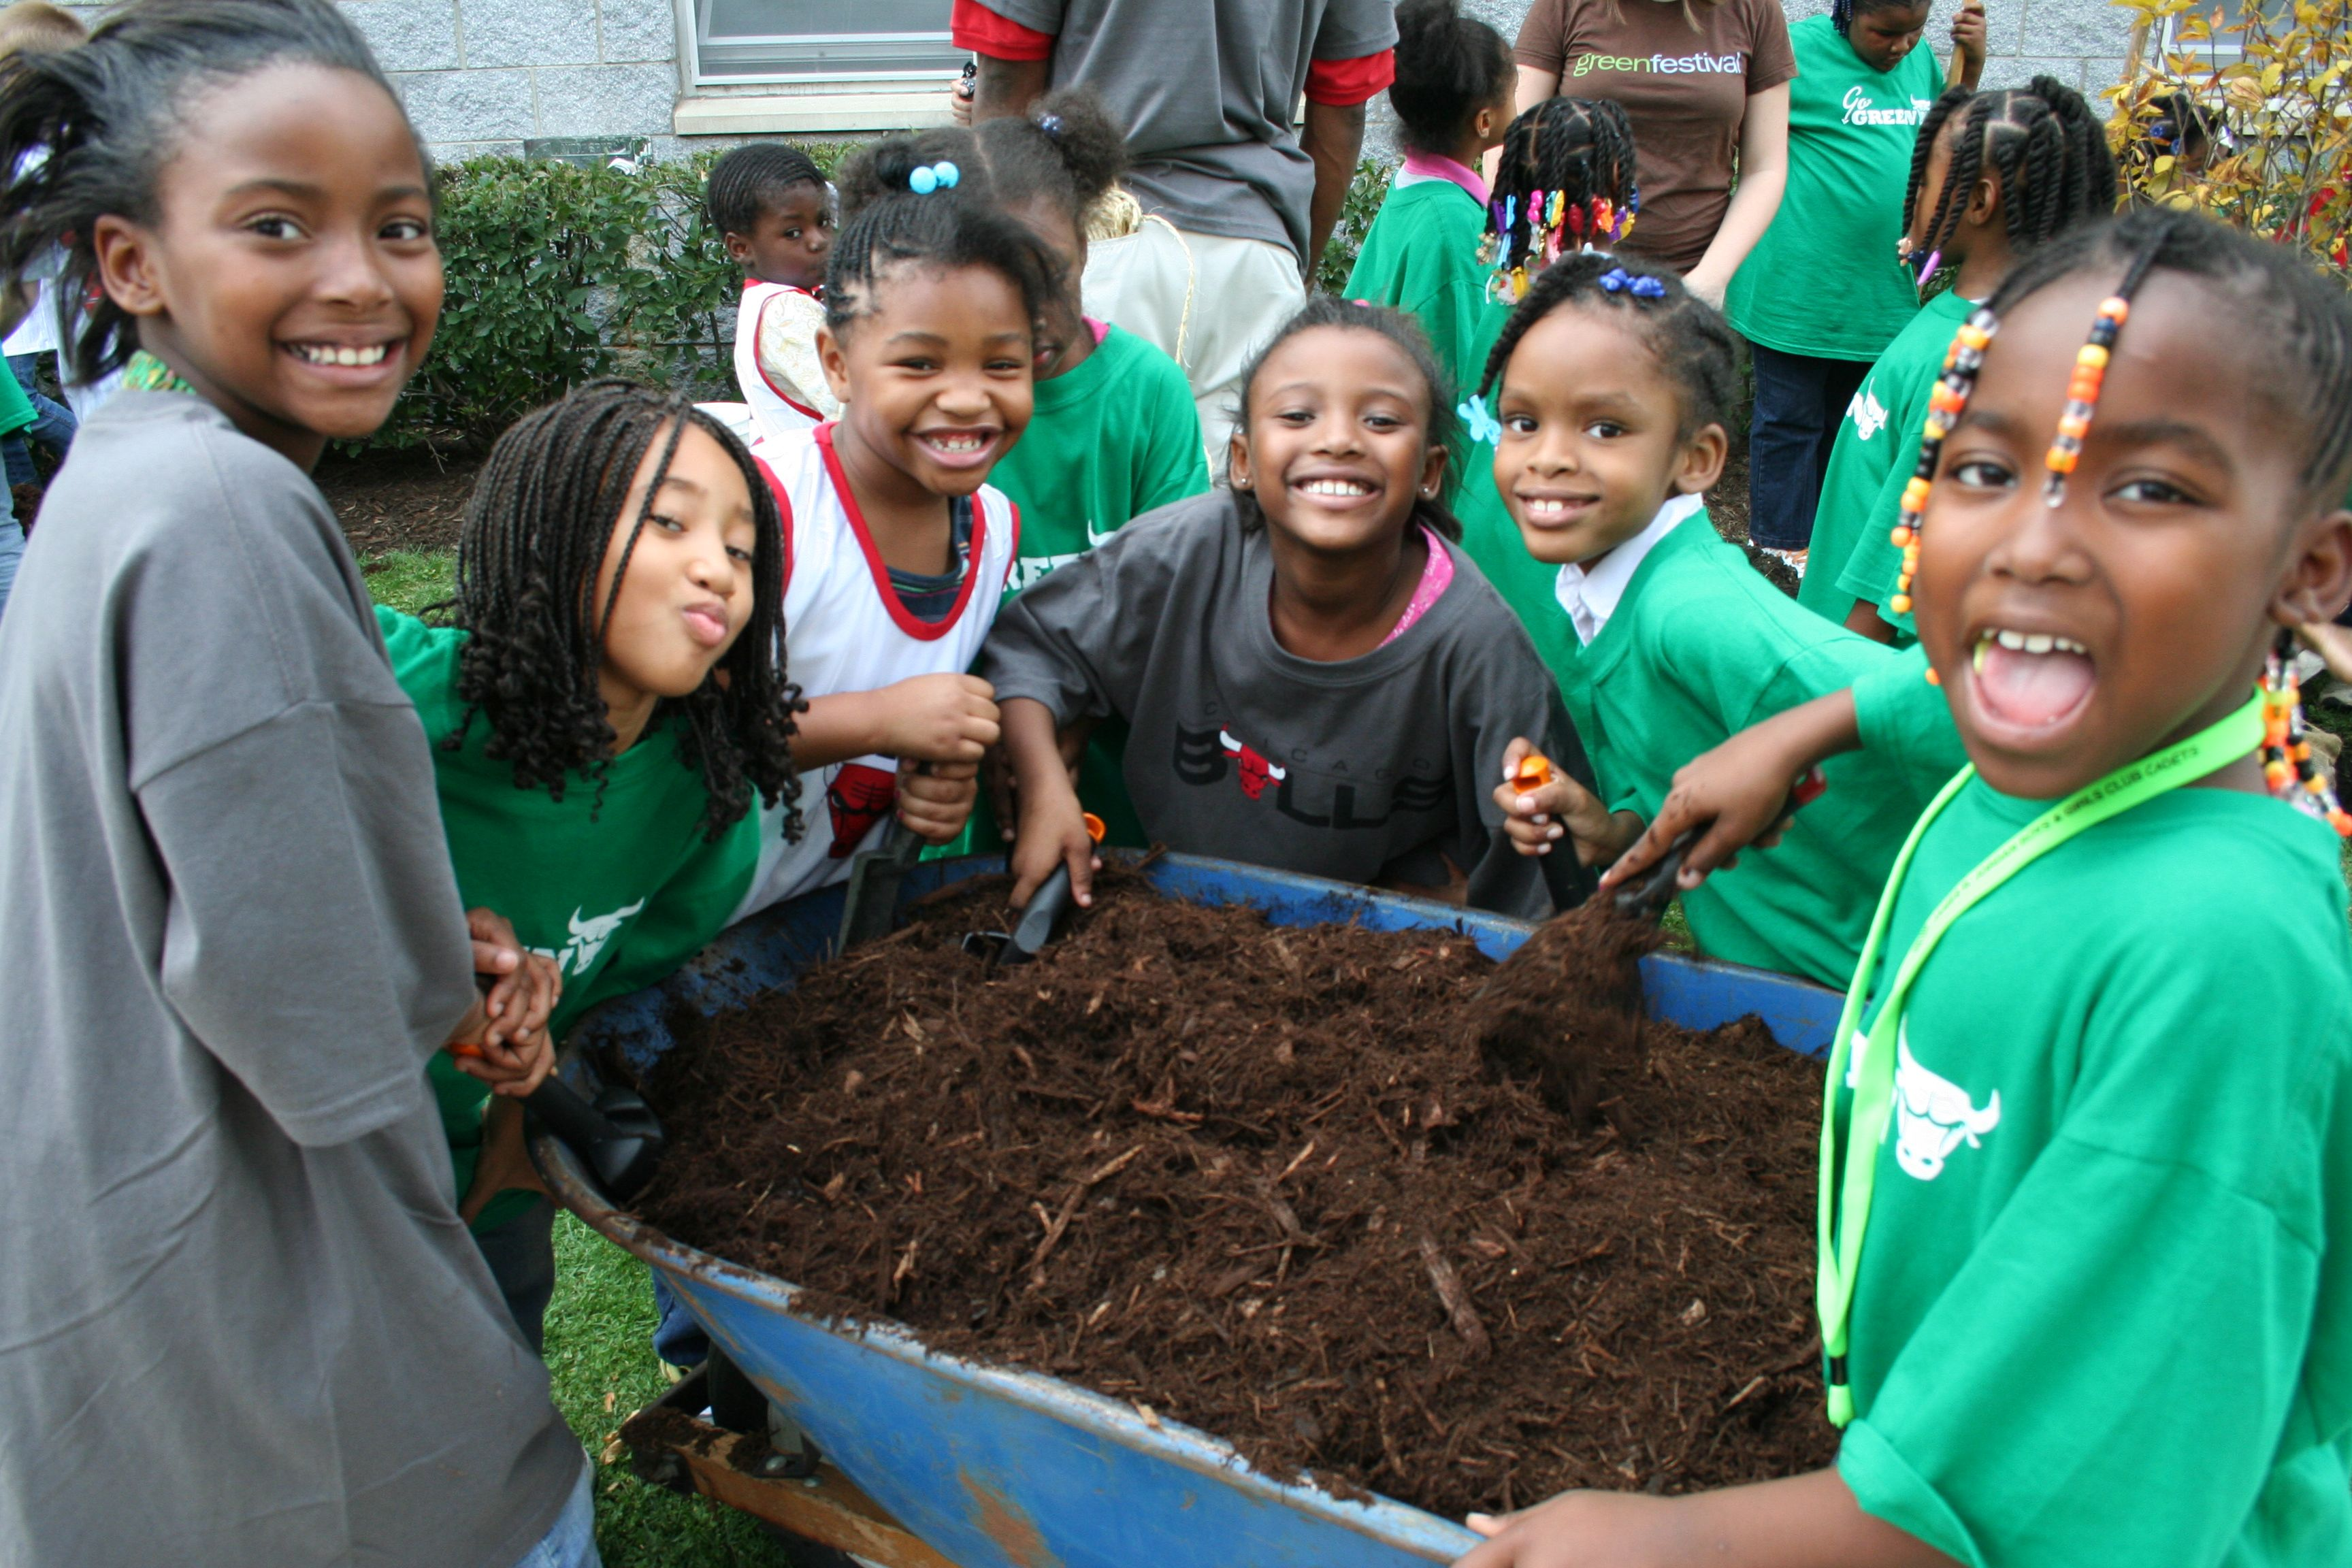 (10-13-2010) Chicago Bulls #greeningchicago www.gatewaygreen.org